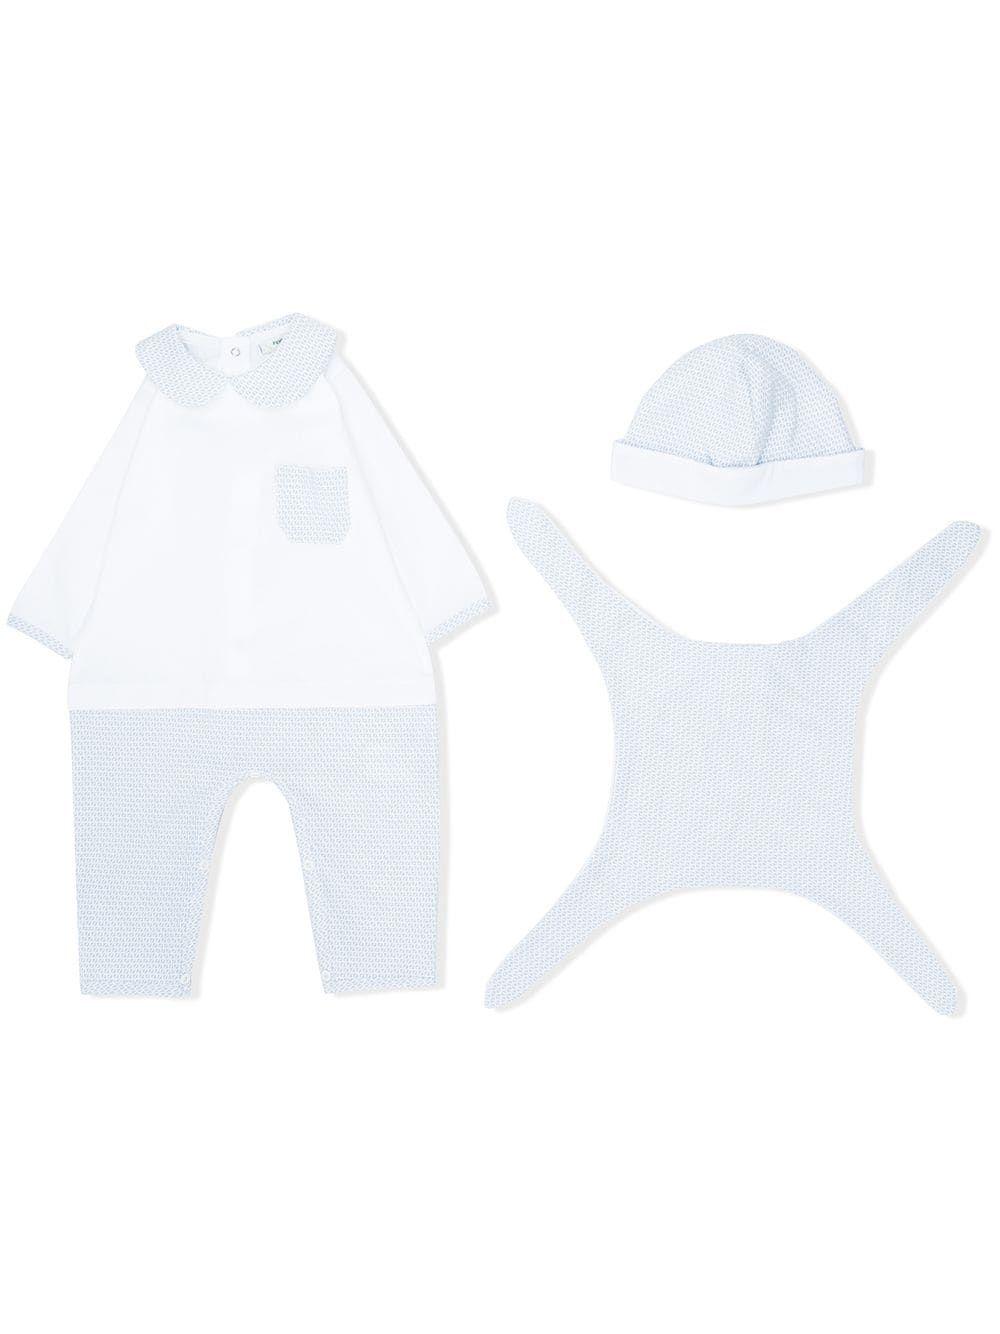 FSW232 / BLUE / FENDI BABY MONOGRAM GIFT SET